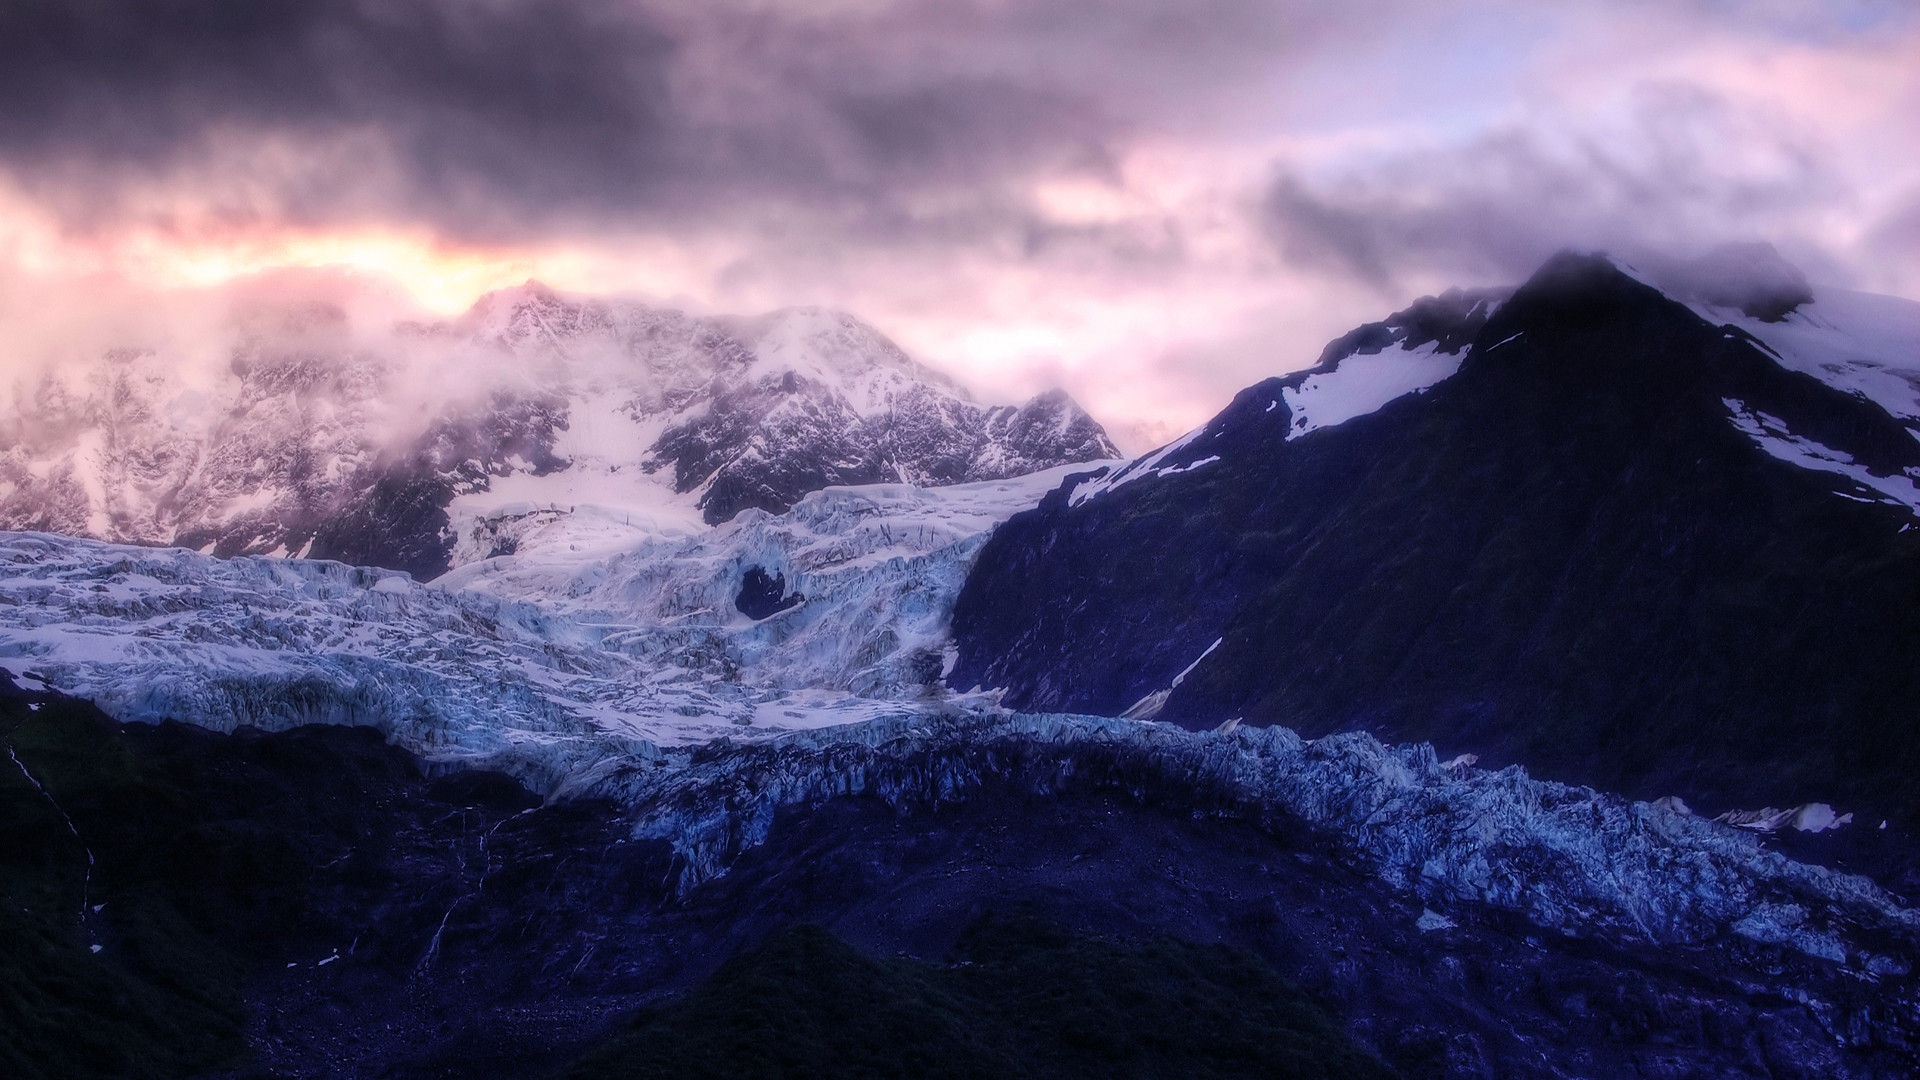 lake and mountains · landscape 1080p · mountain landscape